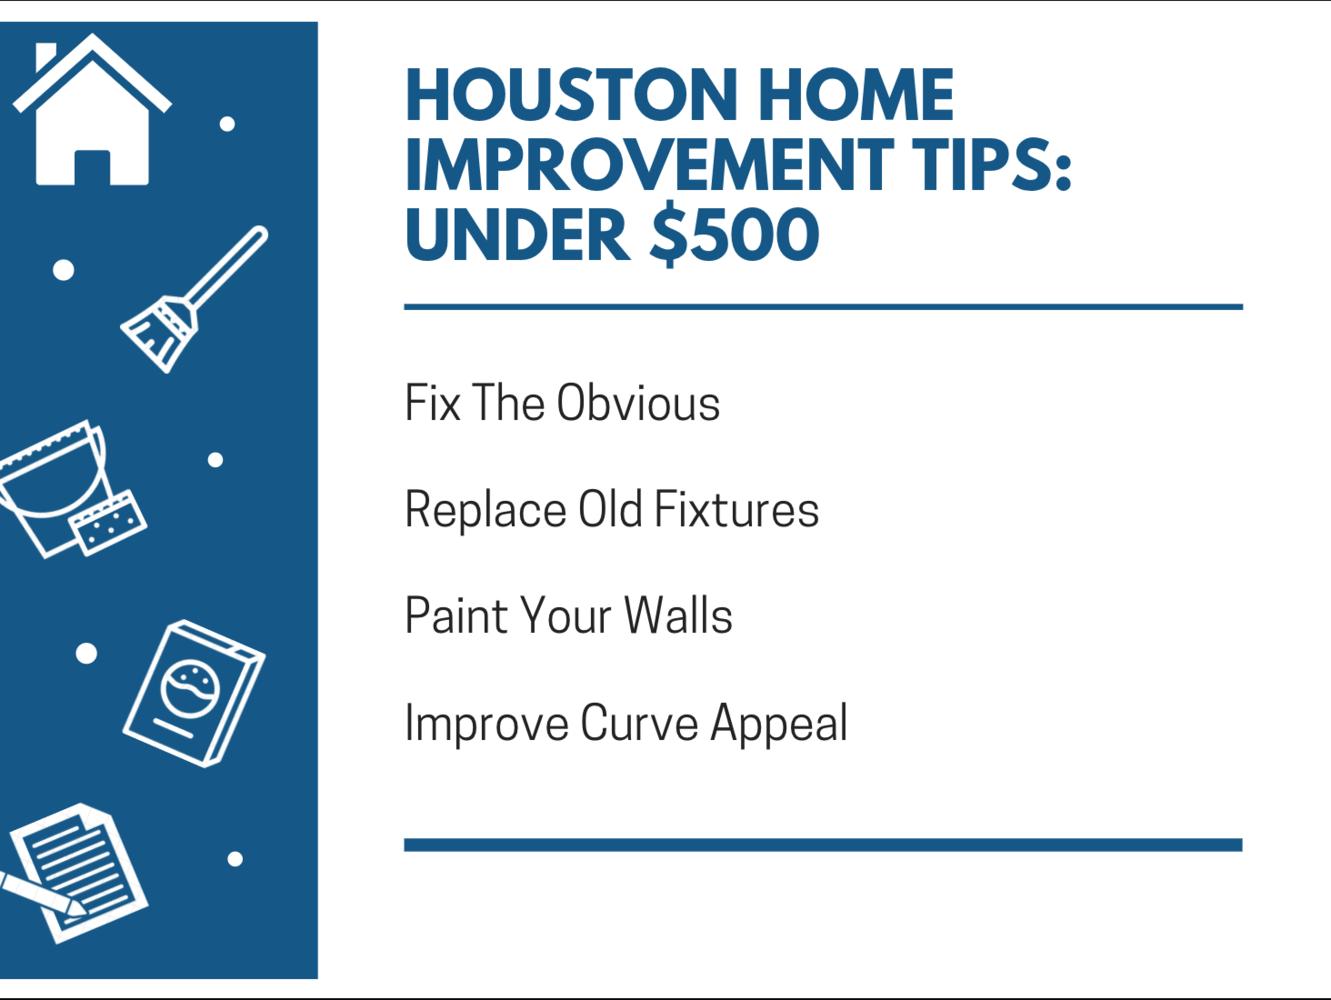 Houston Home Renovation Tips: Under $500